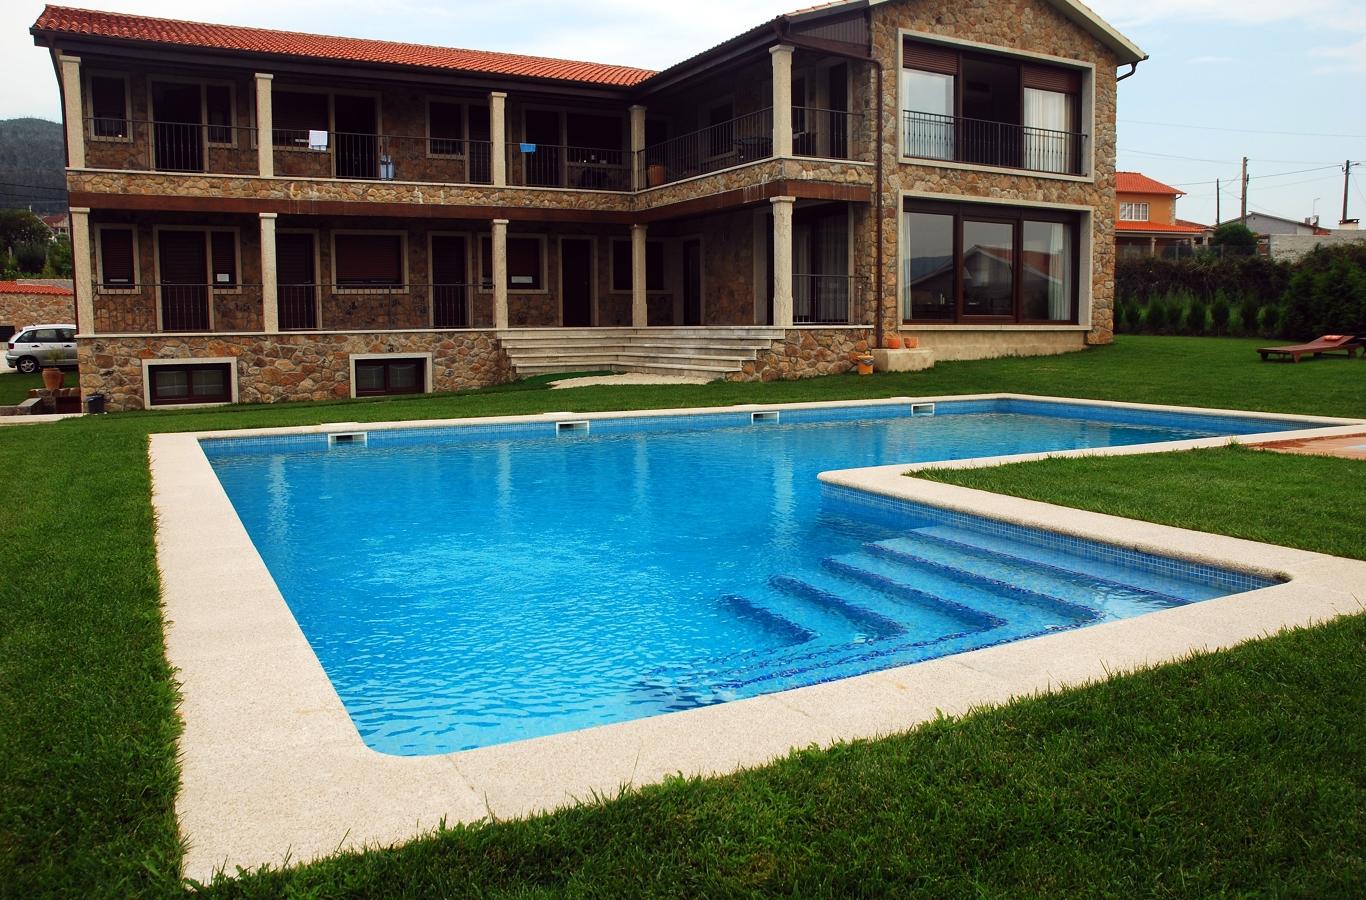 foto piscina 12x6 m de piscinas fraiz 387466 habitissimo